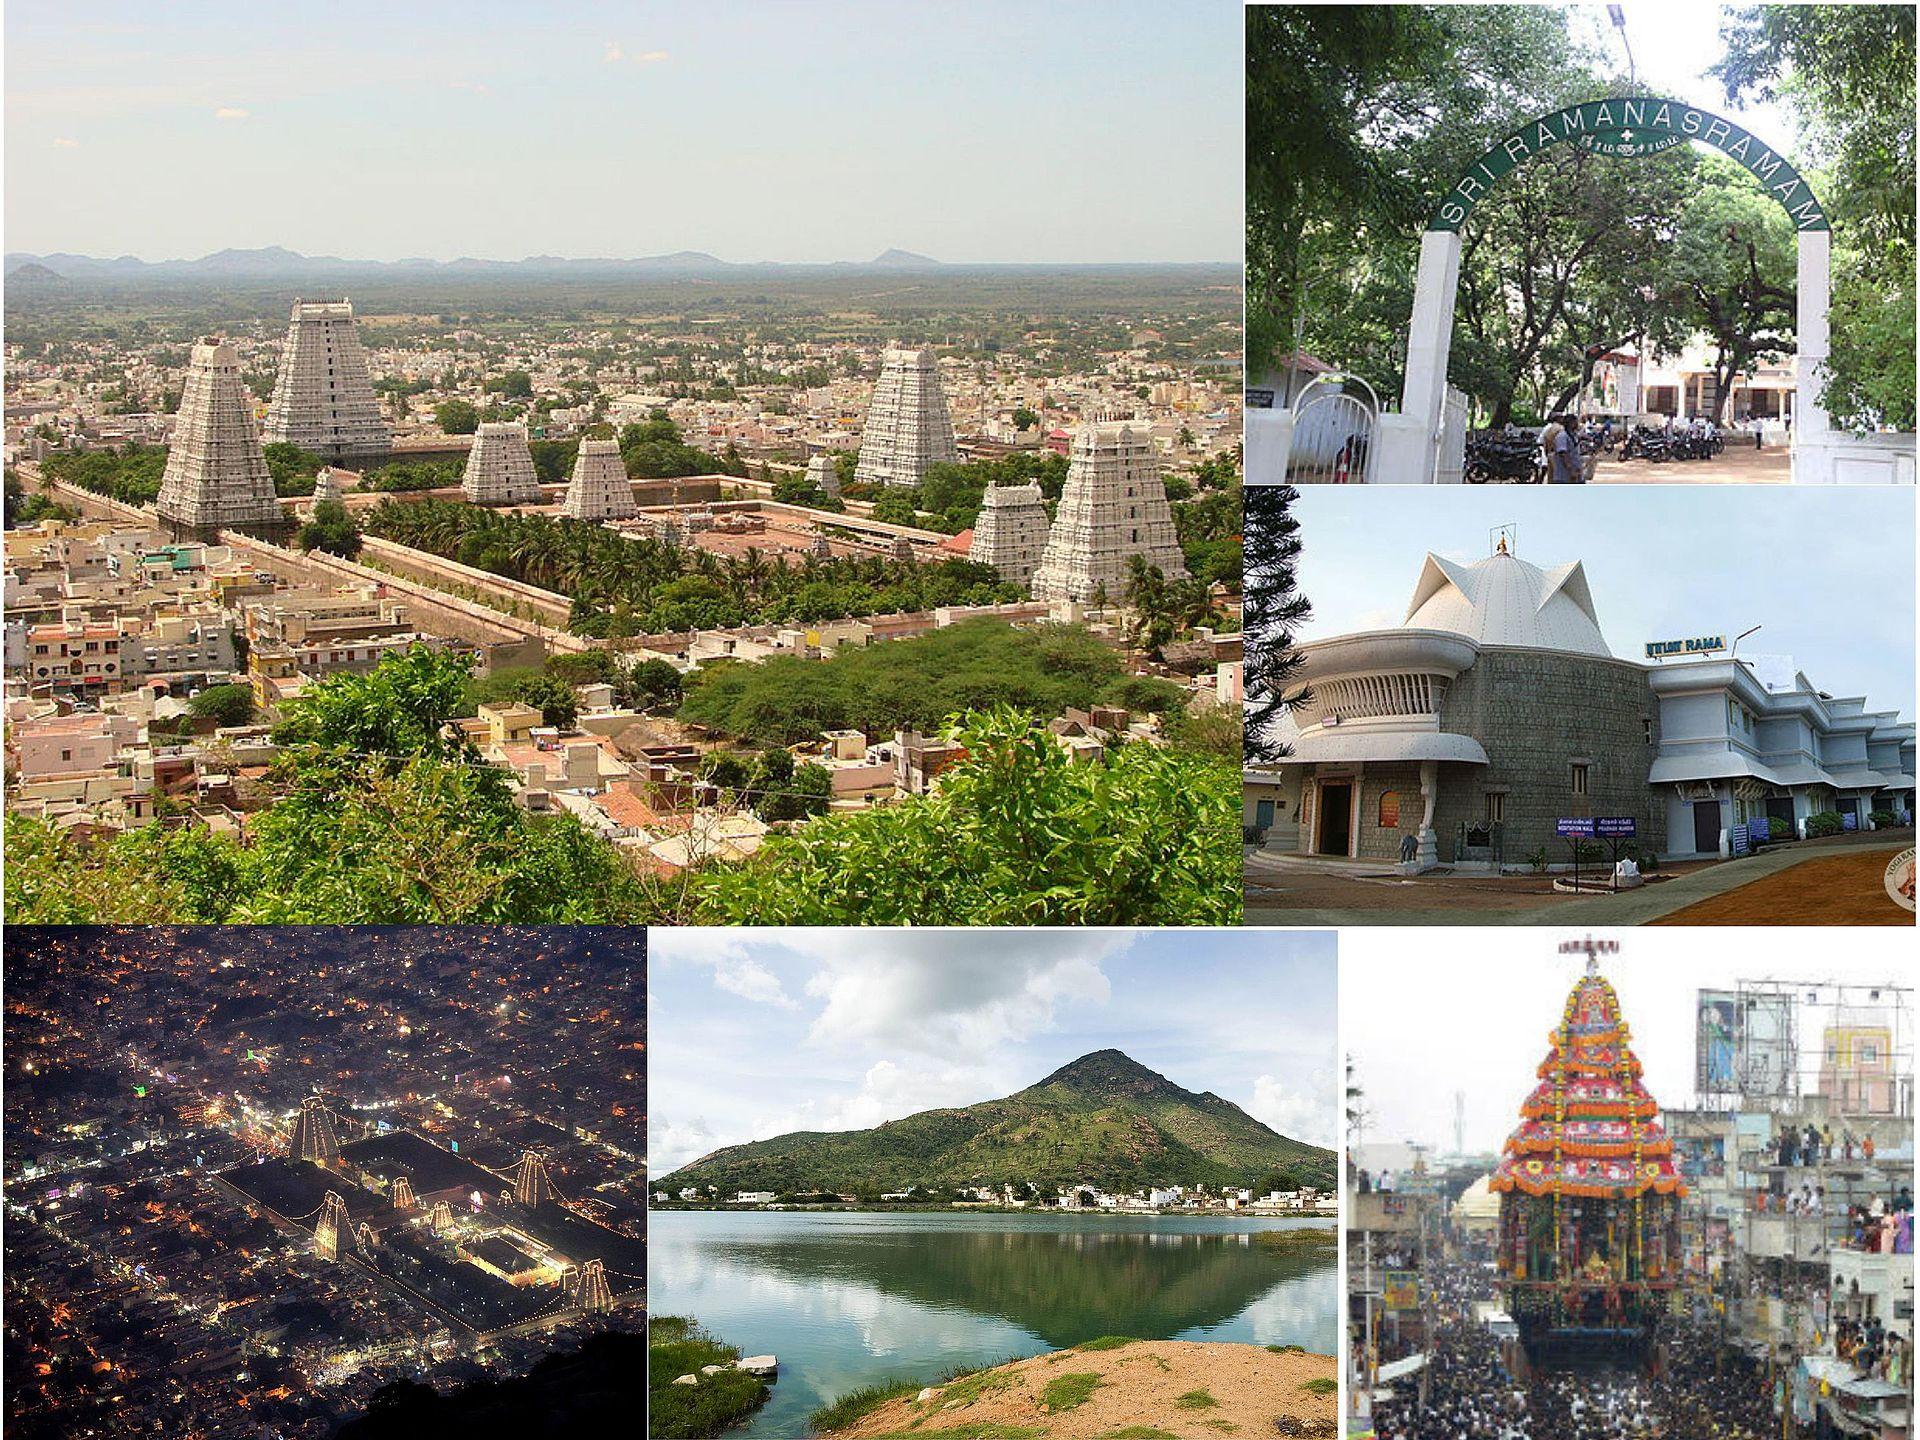 Town Country 2018 >> Tiruvannamalai - Wikipedia